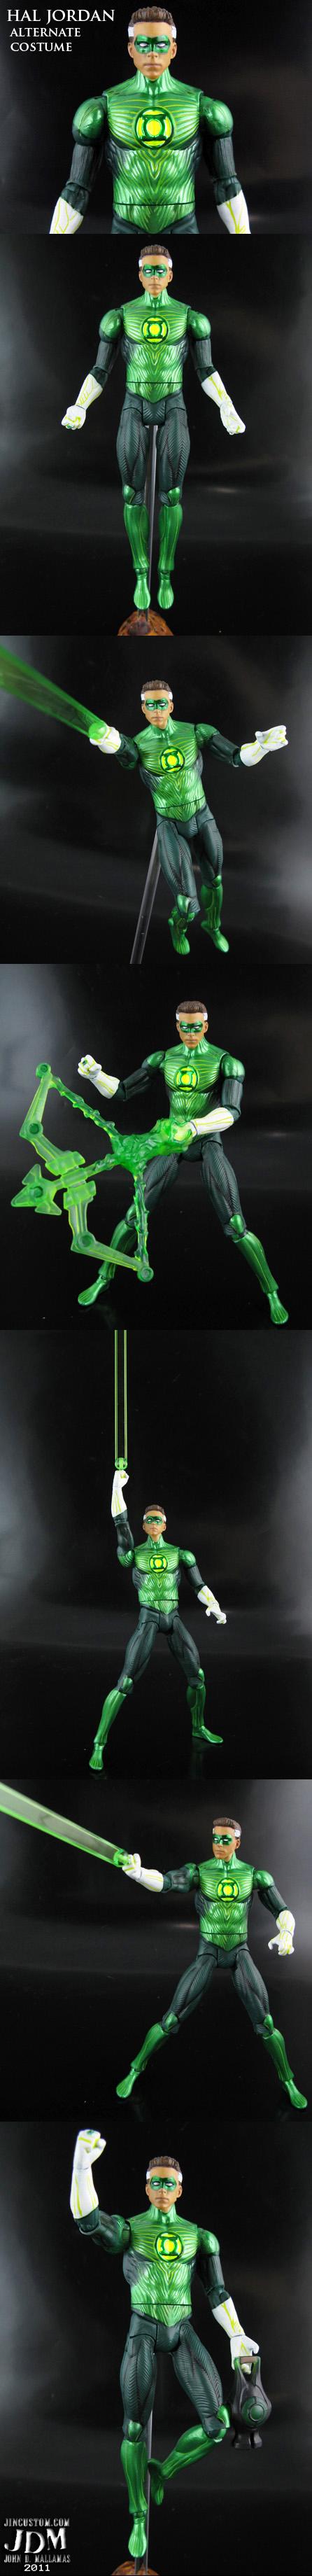 Custom Hal Jordan